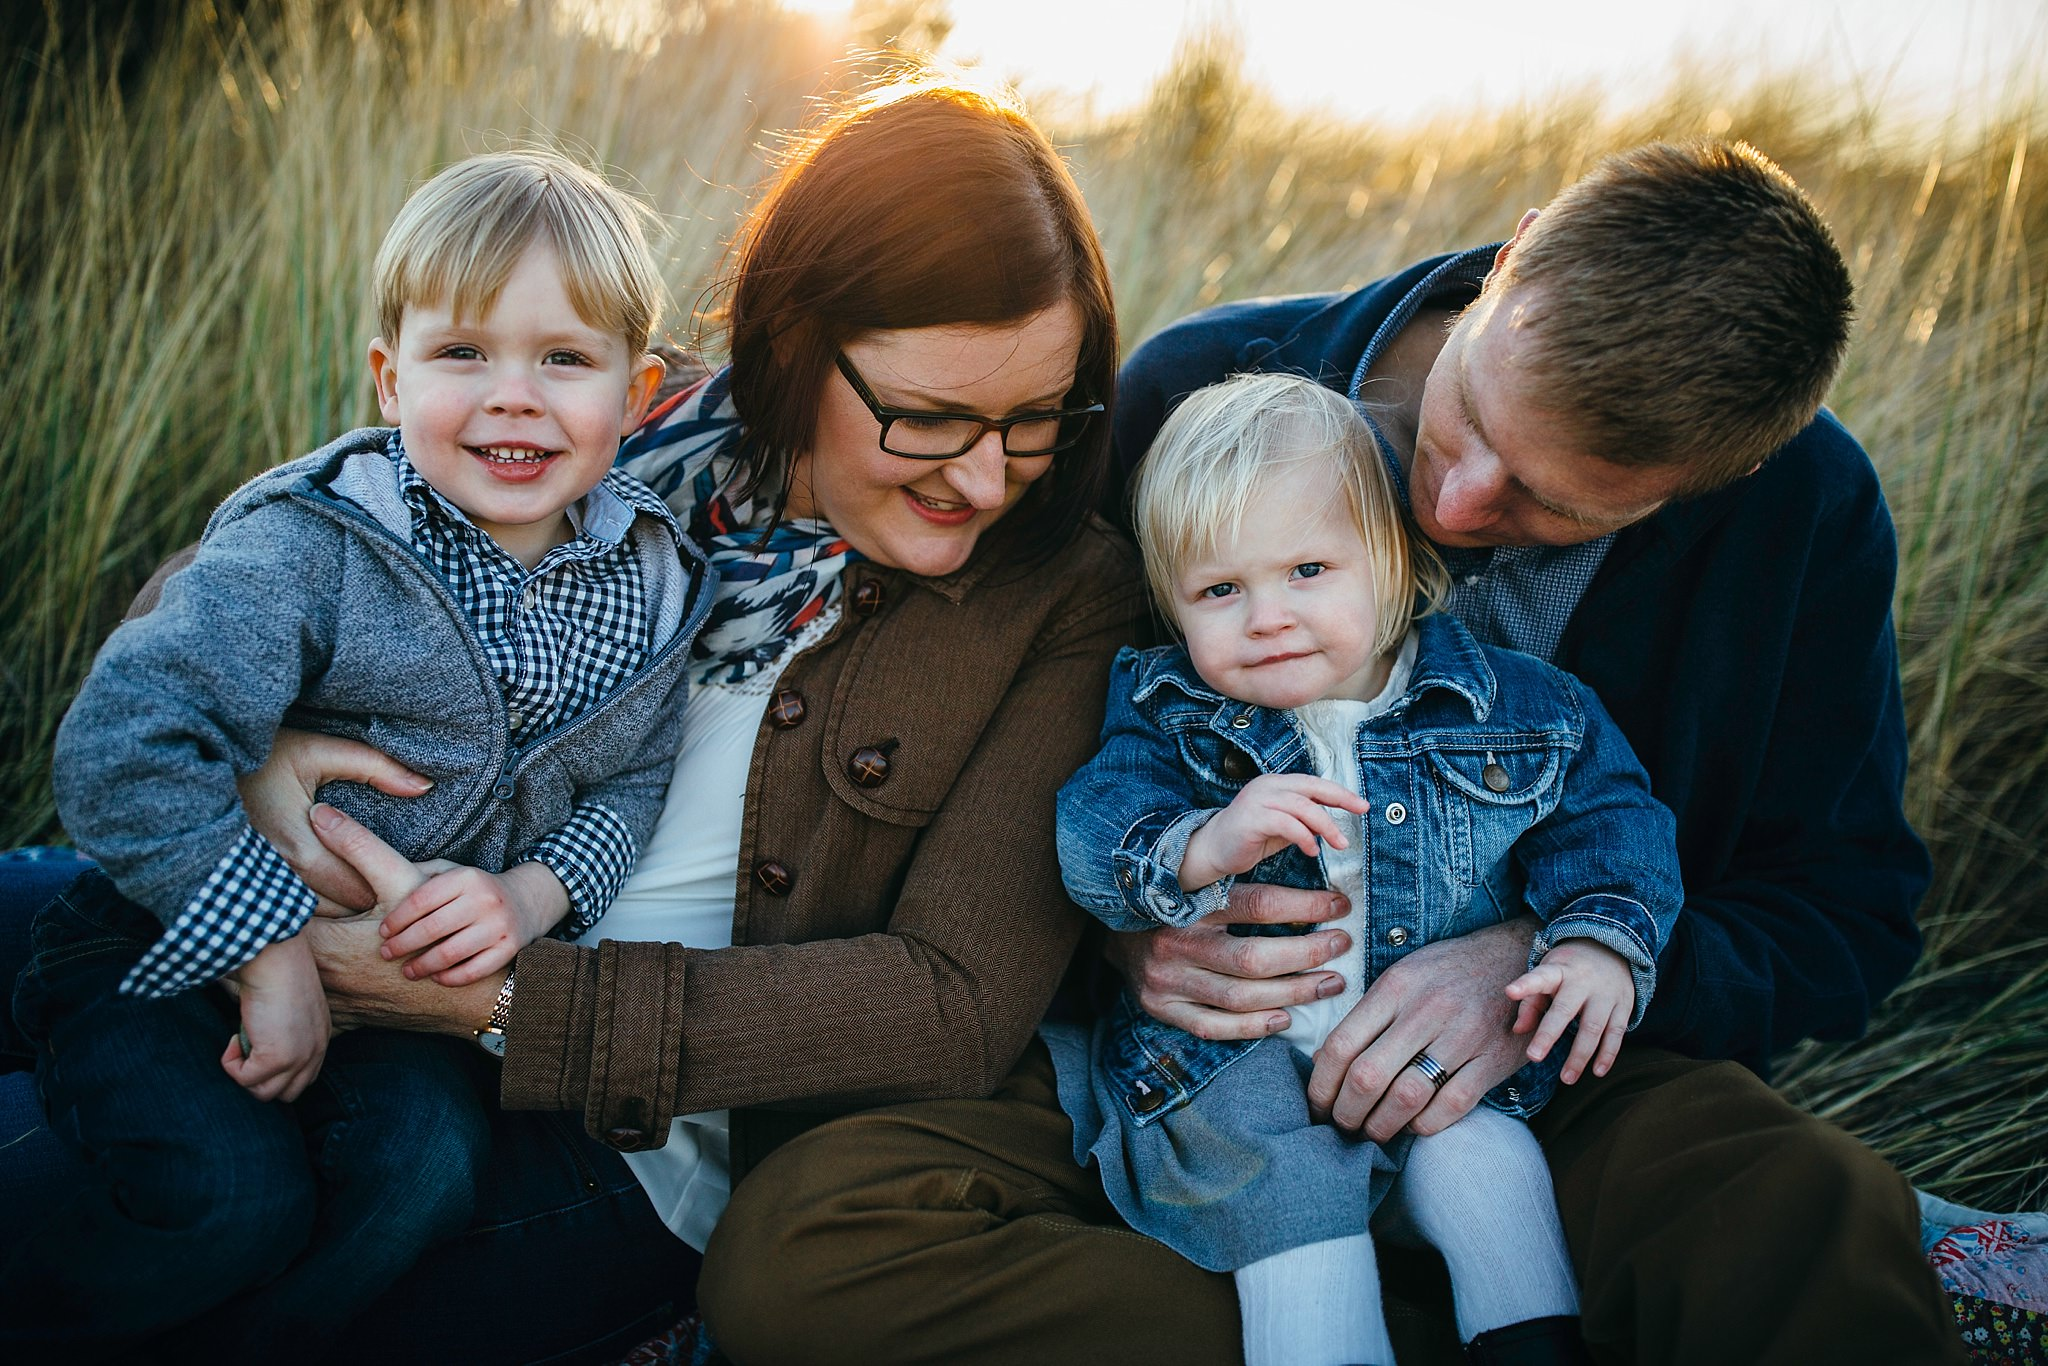 anacortes-family-photographer_0015.jpg